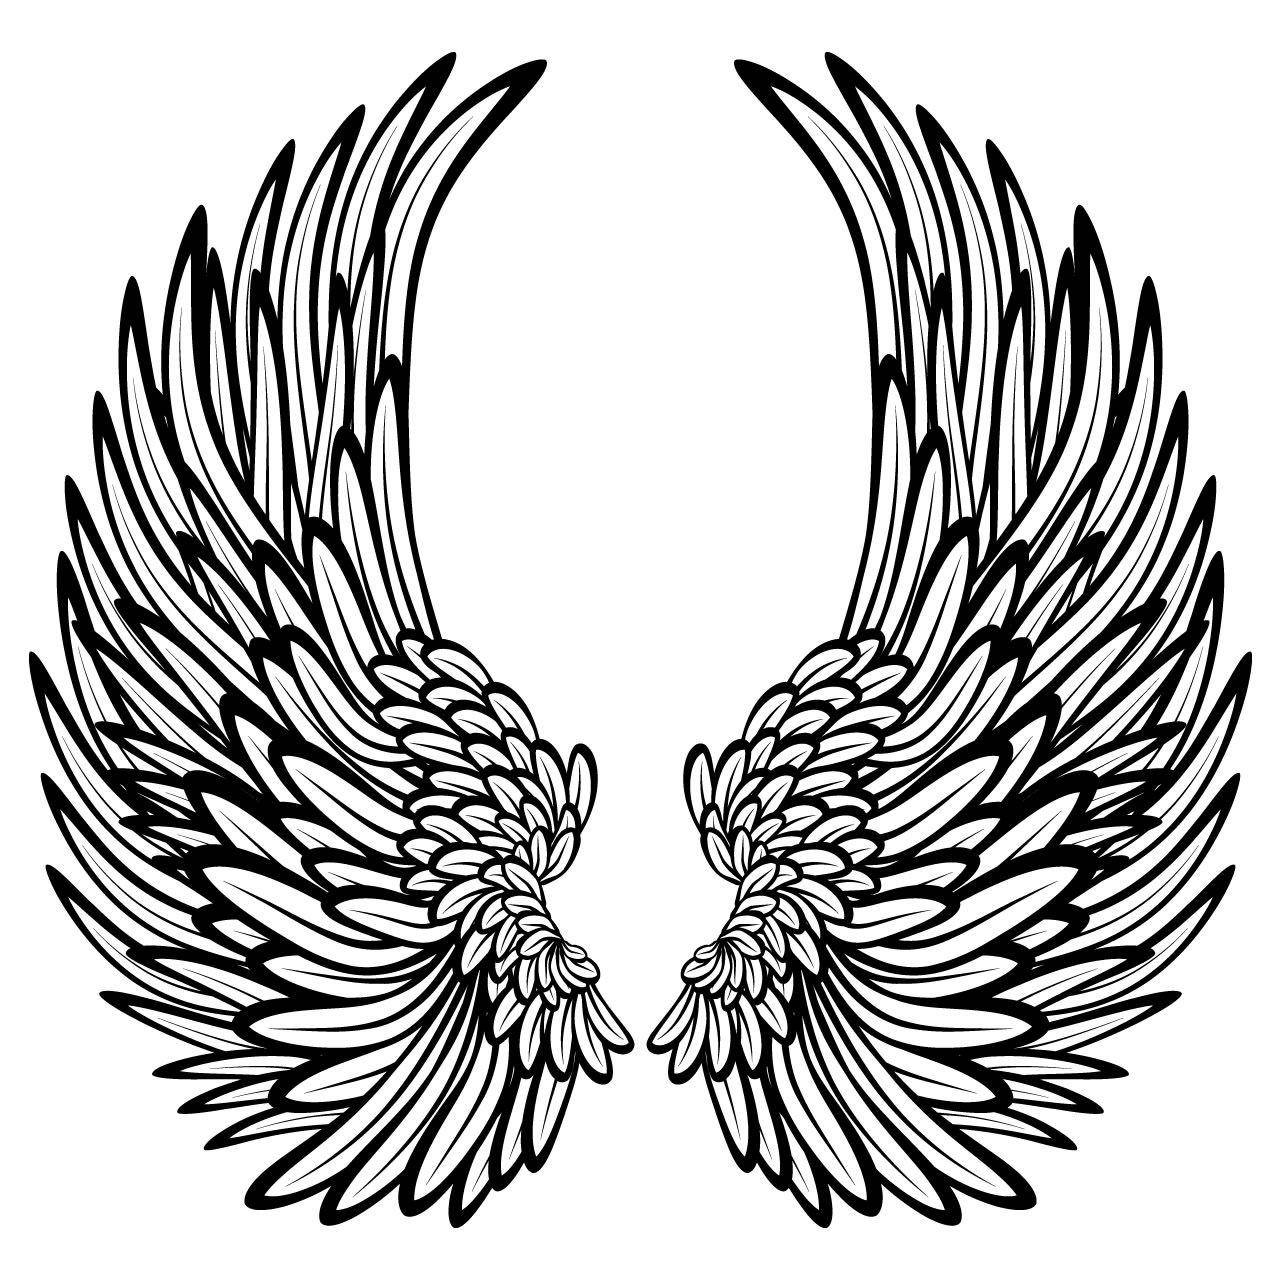 1280x1280 angel wings angels wings angel wings wall, wings, wings drawing